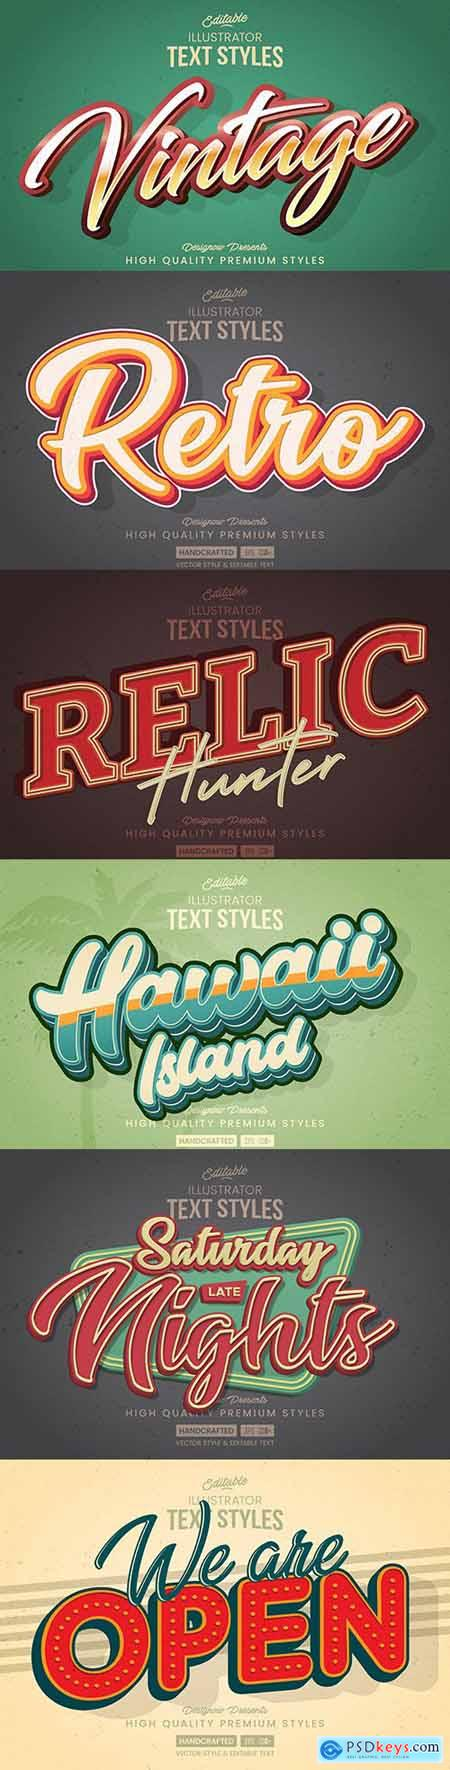 Editable retro font effect text collection illustration design